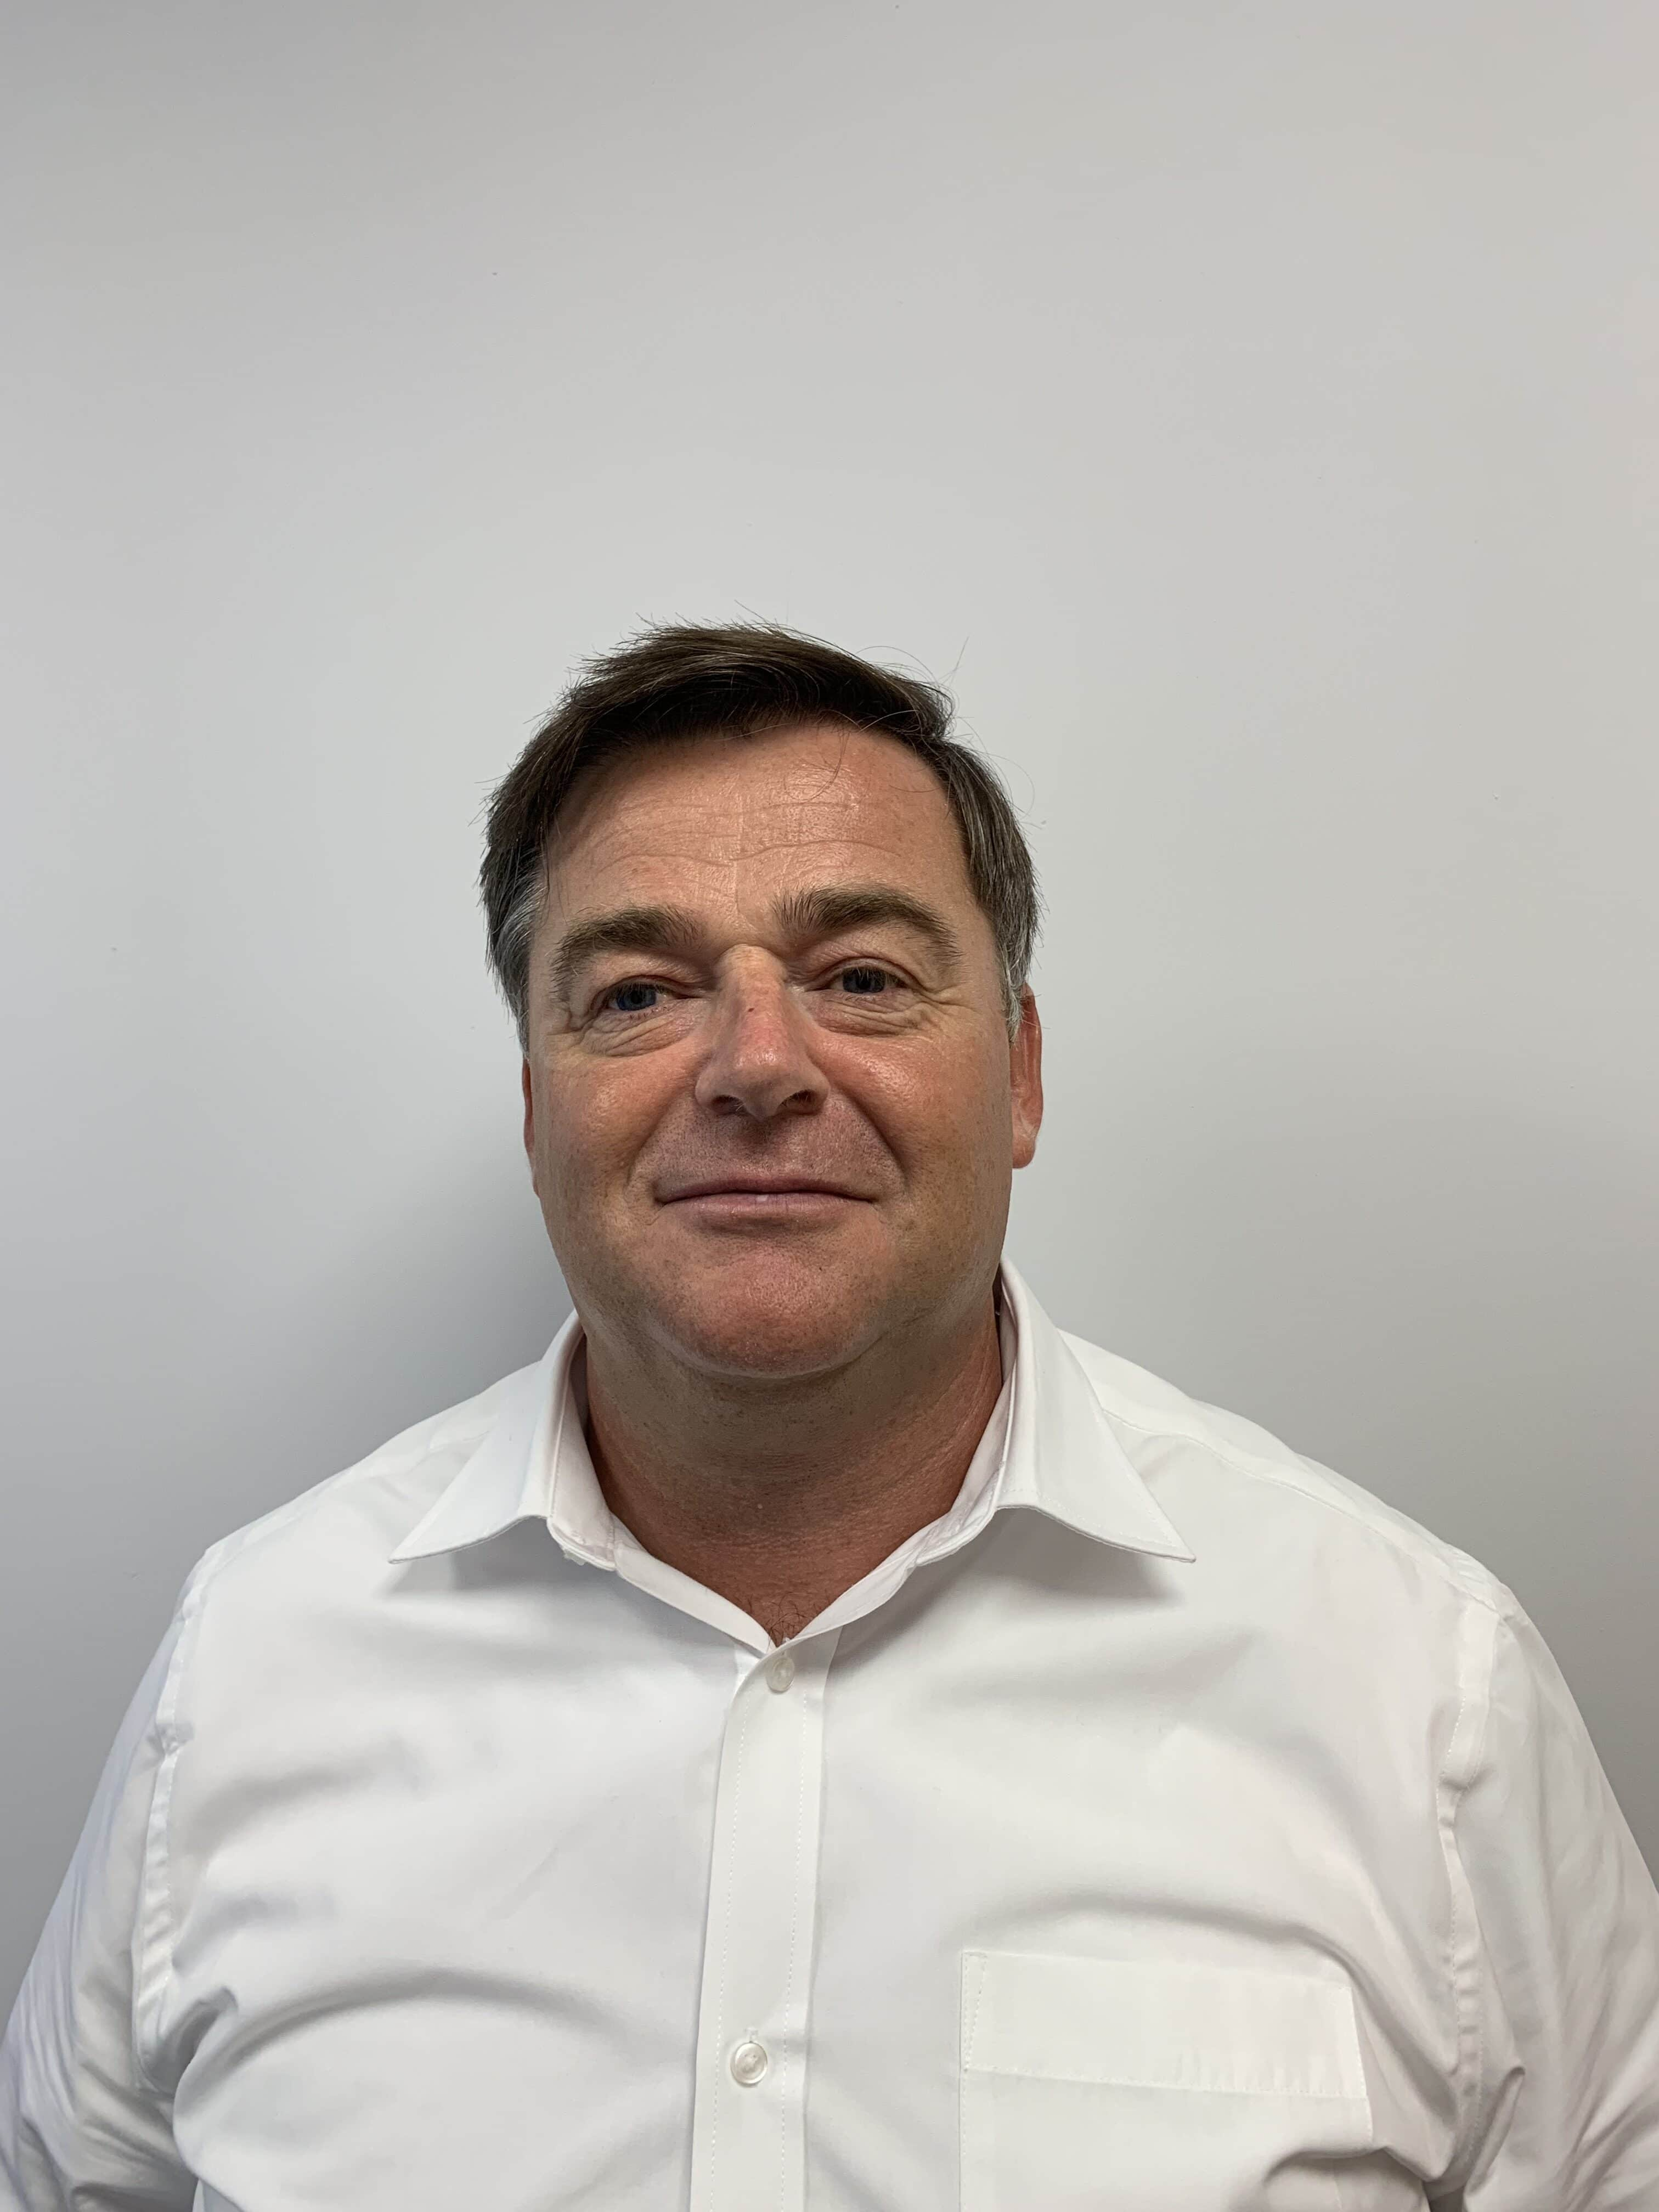 Justin White sales consultant